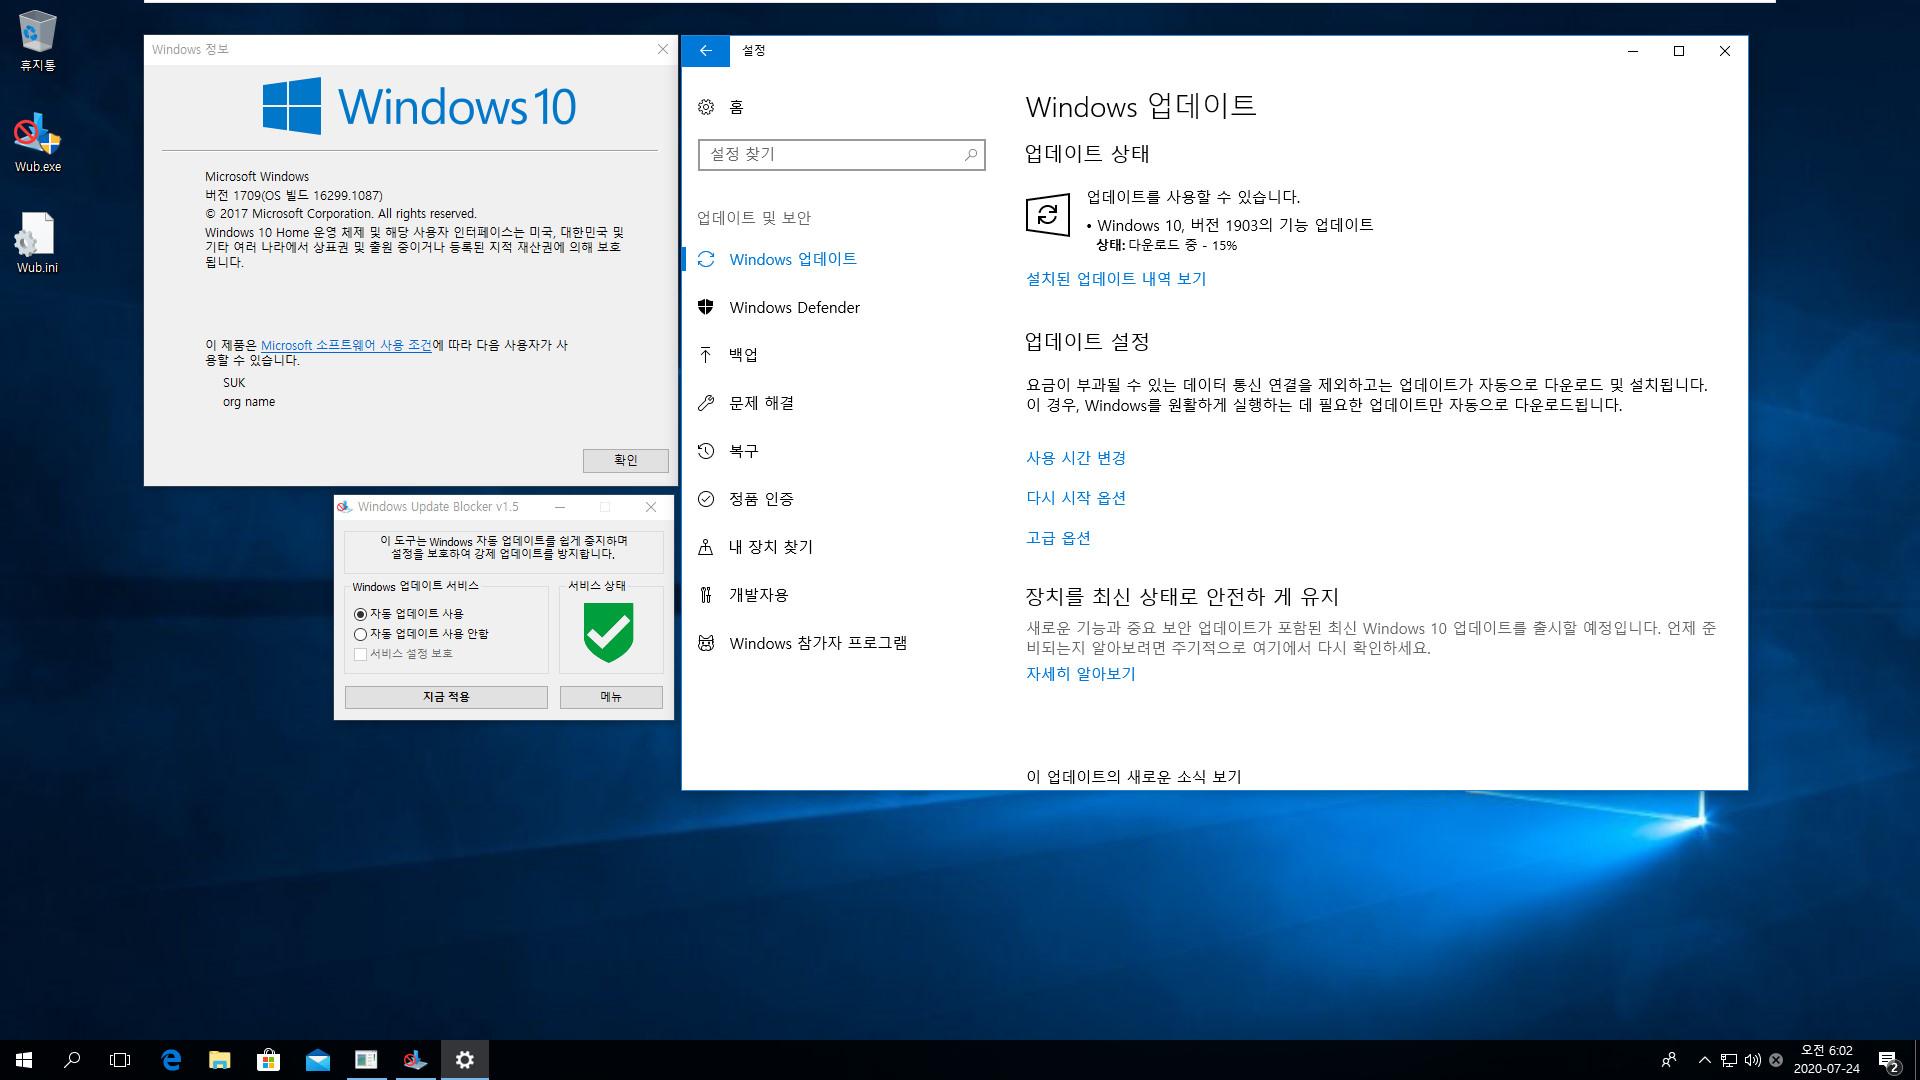 Windows Update Blocker v1.5 업데이트 방지 테스트 - 윈도우는 버전 1709으로 현재 강제 업데이트 중인 버전이고 홈 에디션 2020-07-24_060244.jpg